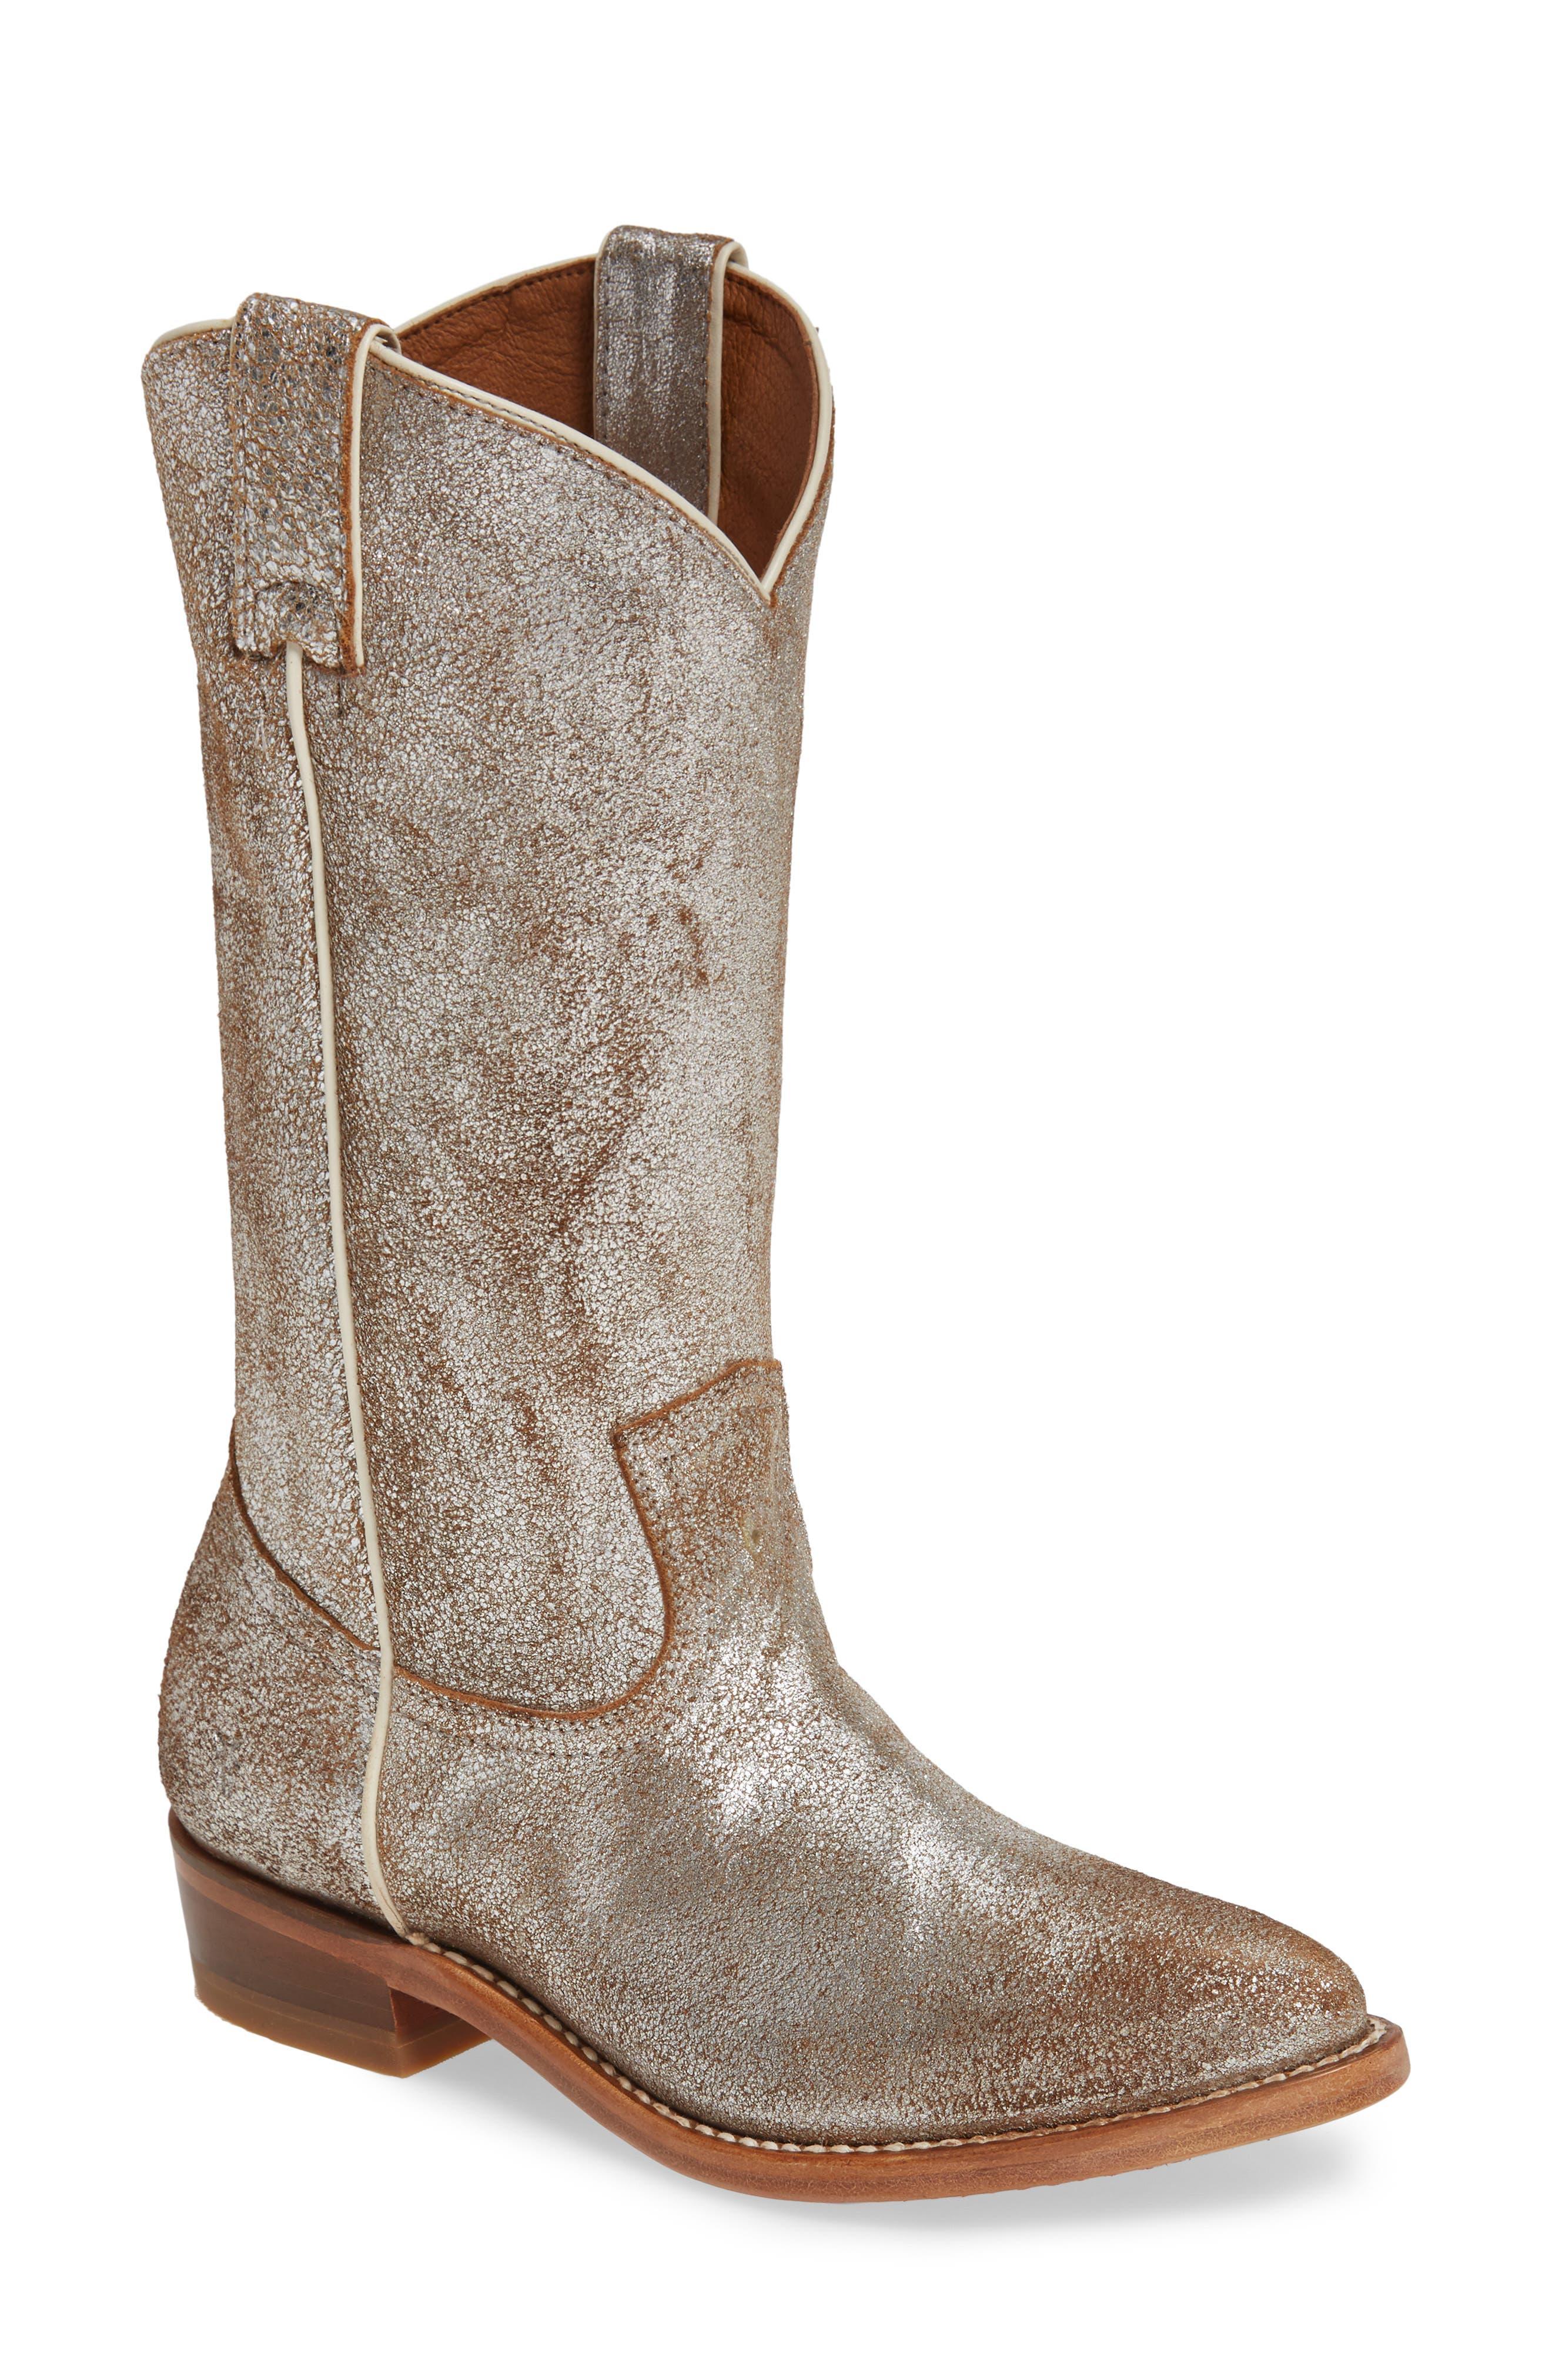 Frye Billy Pull-On Boot, Metallic